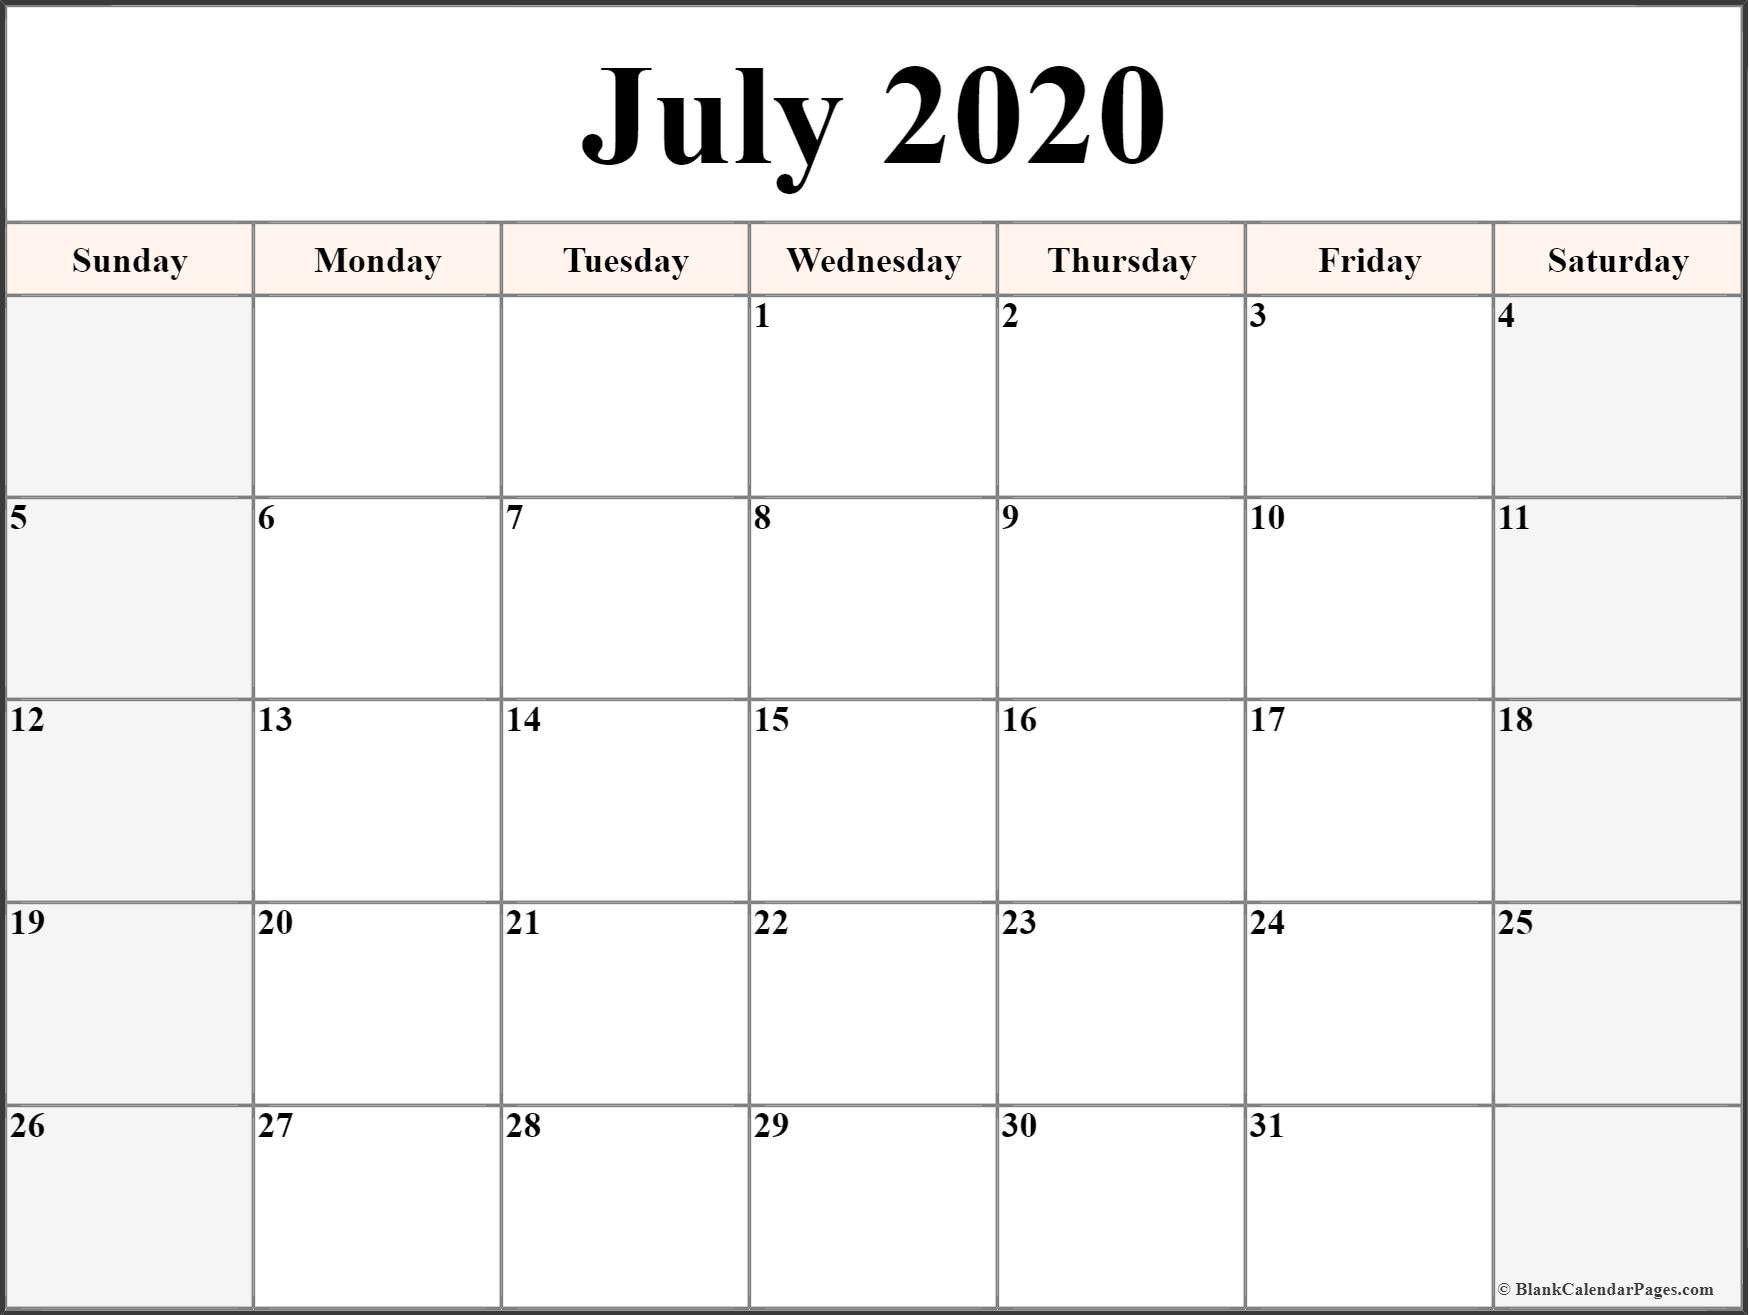 Printable Calendar Templates 2020 In 2020 | Blank Calendar in 2020 Calendar To Fill In